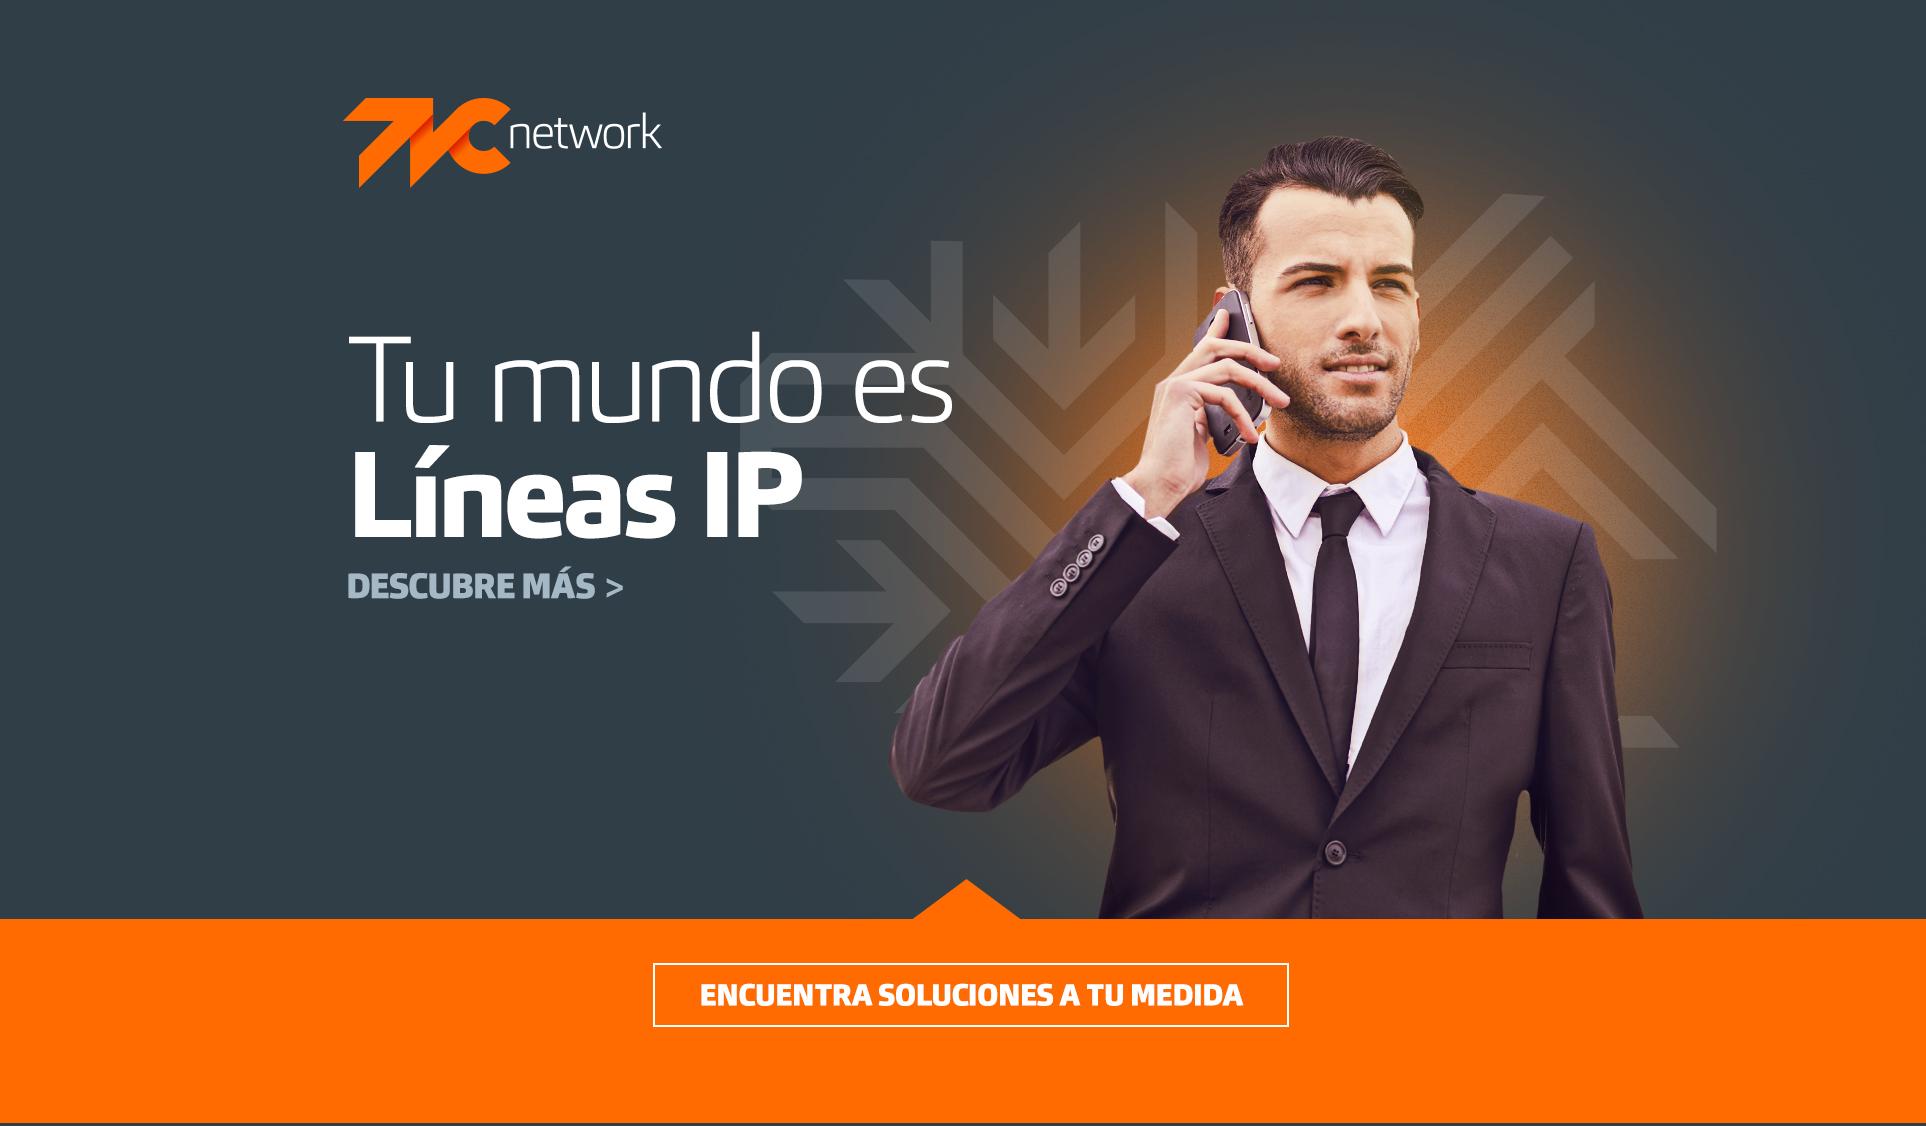 Lineas IP